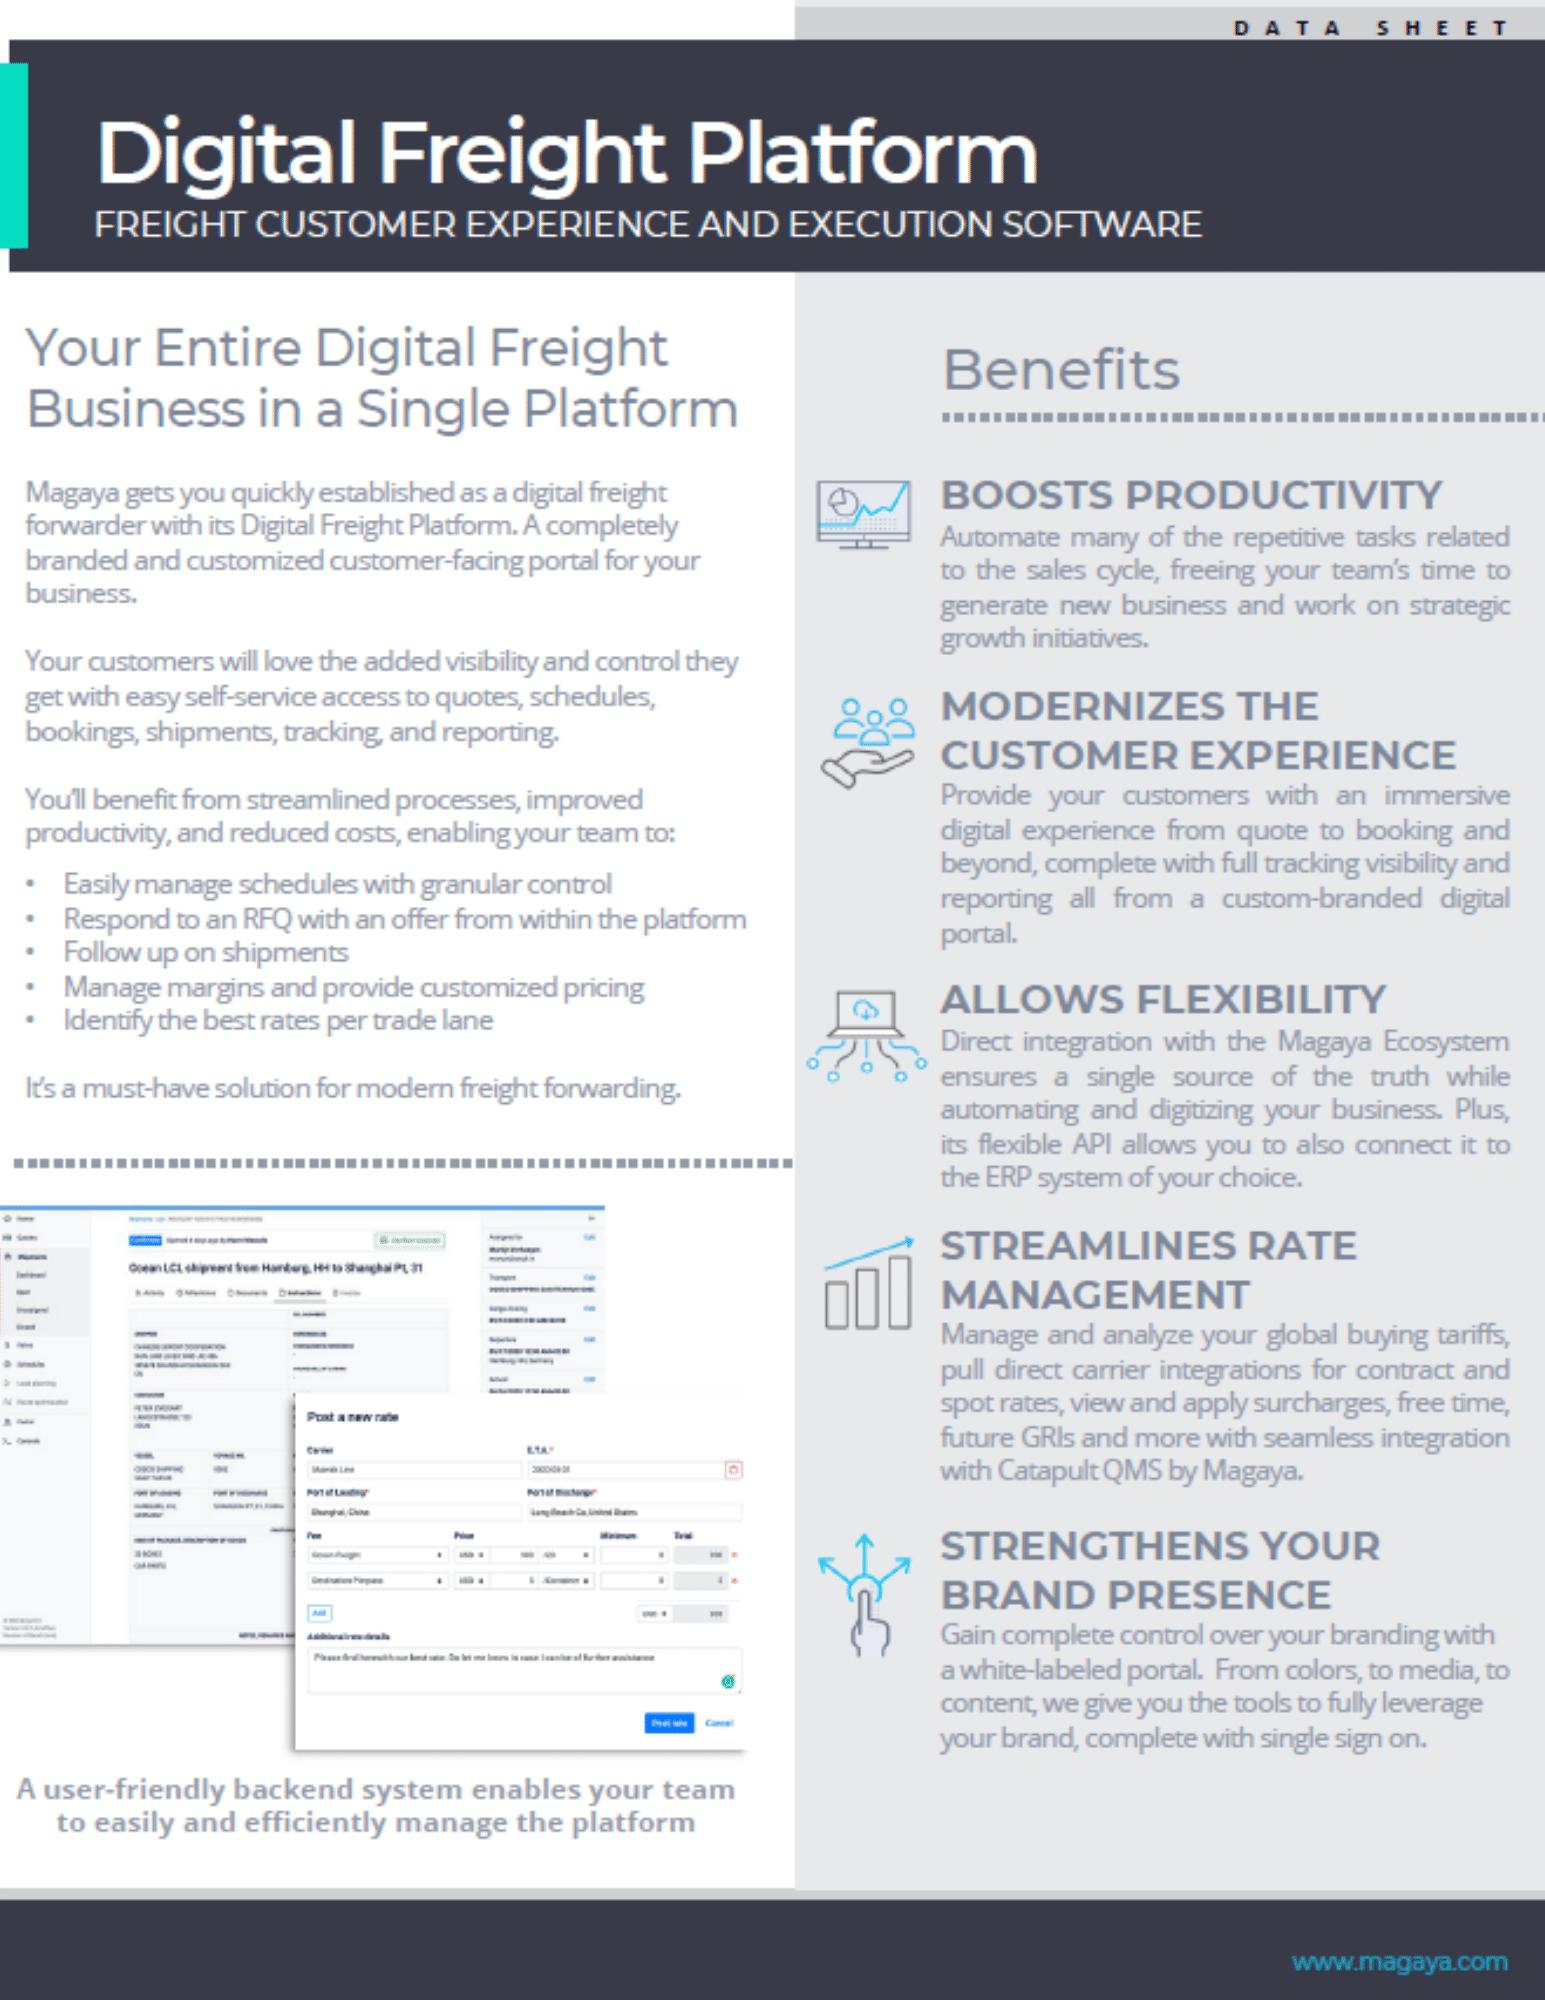 Digital Freight Platform